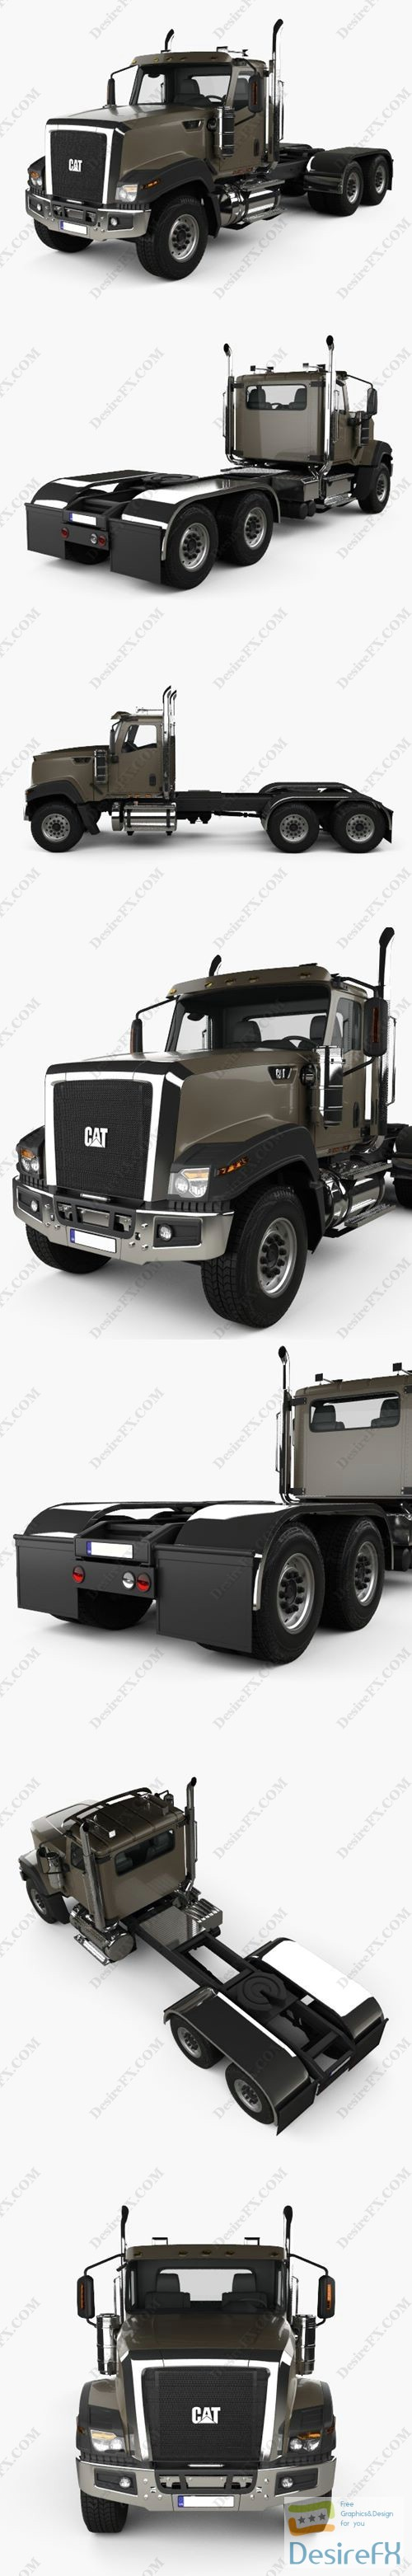 Caterpillar CT 680 Tractor Truck 2015 3D Model